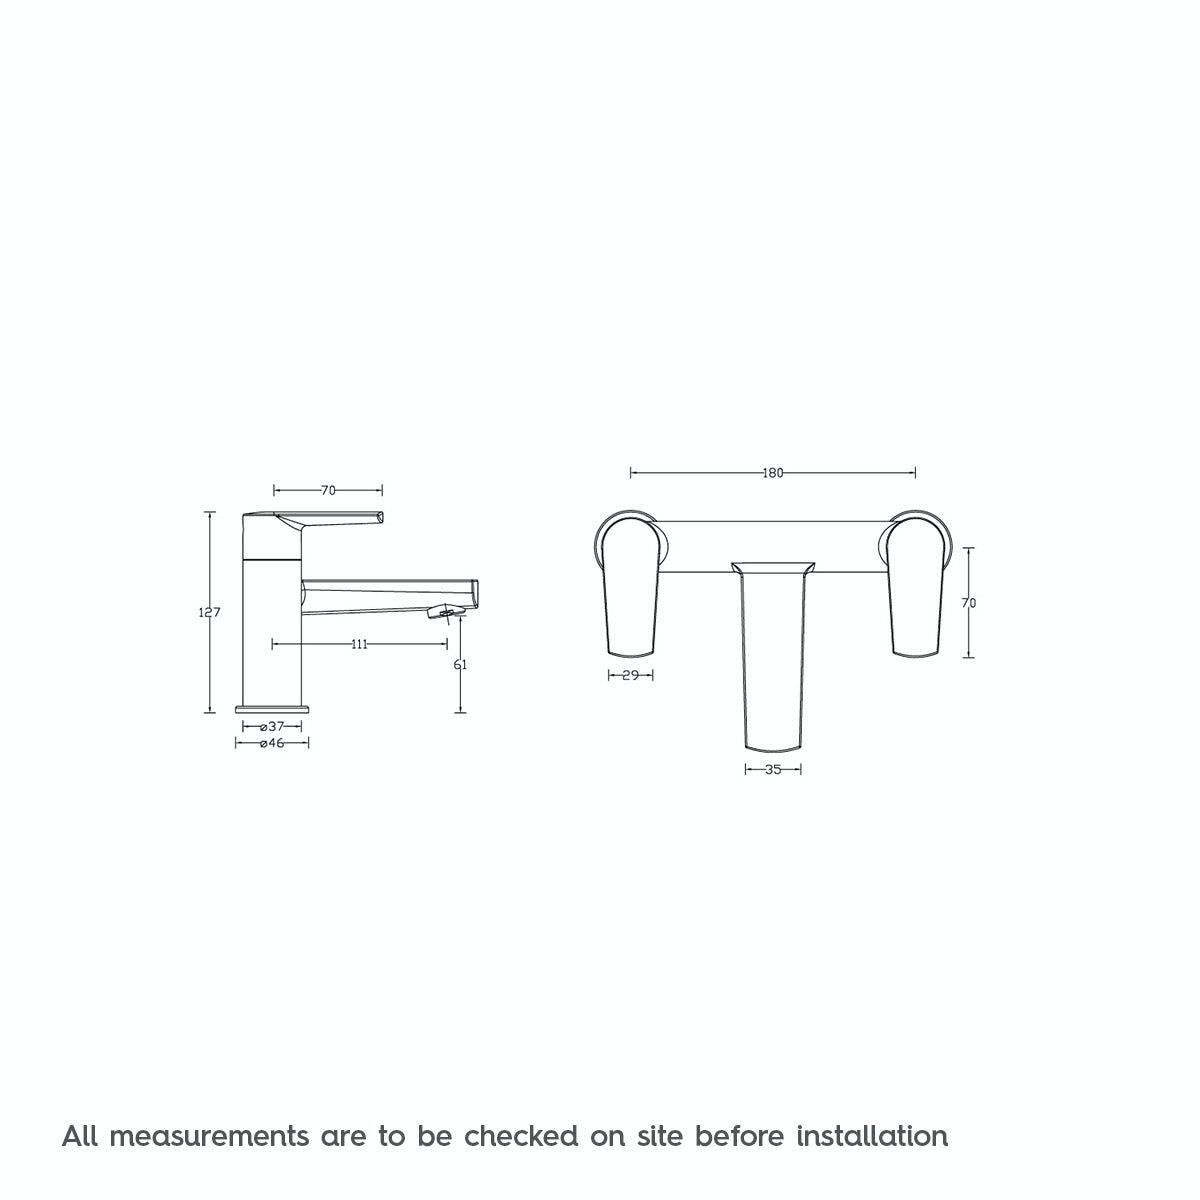 Dimensions for Langdale bath mixer tap